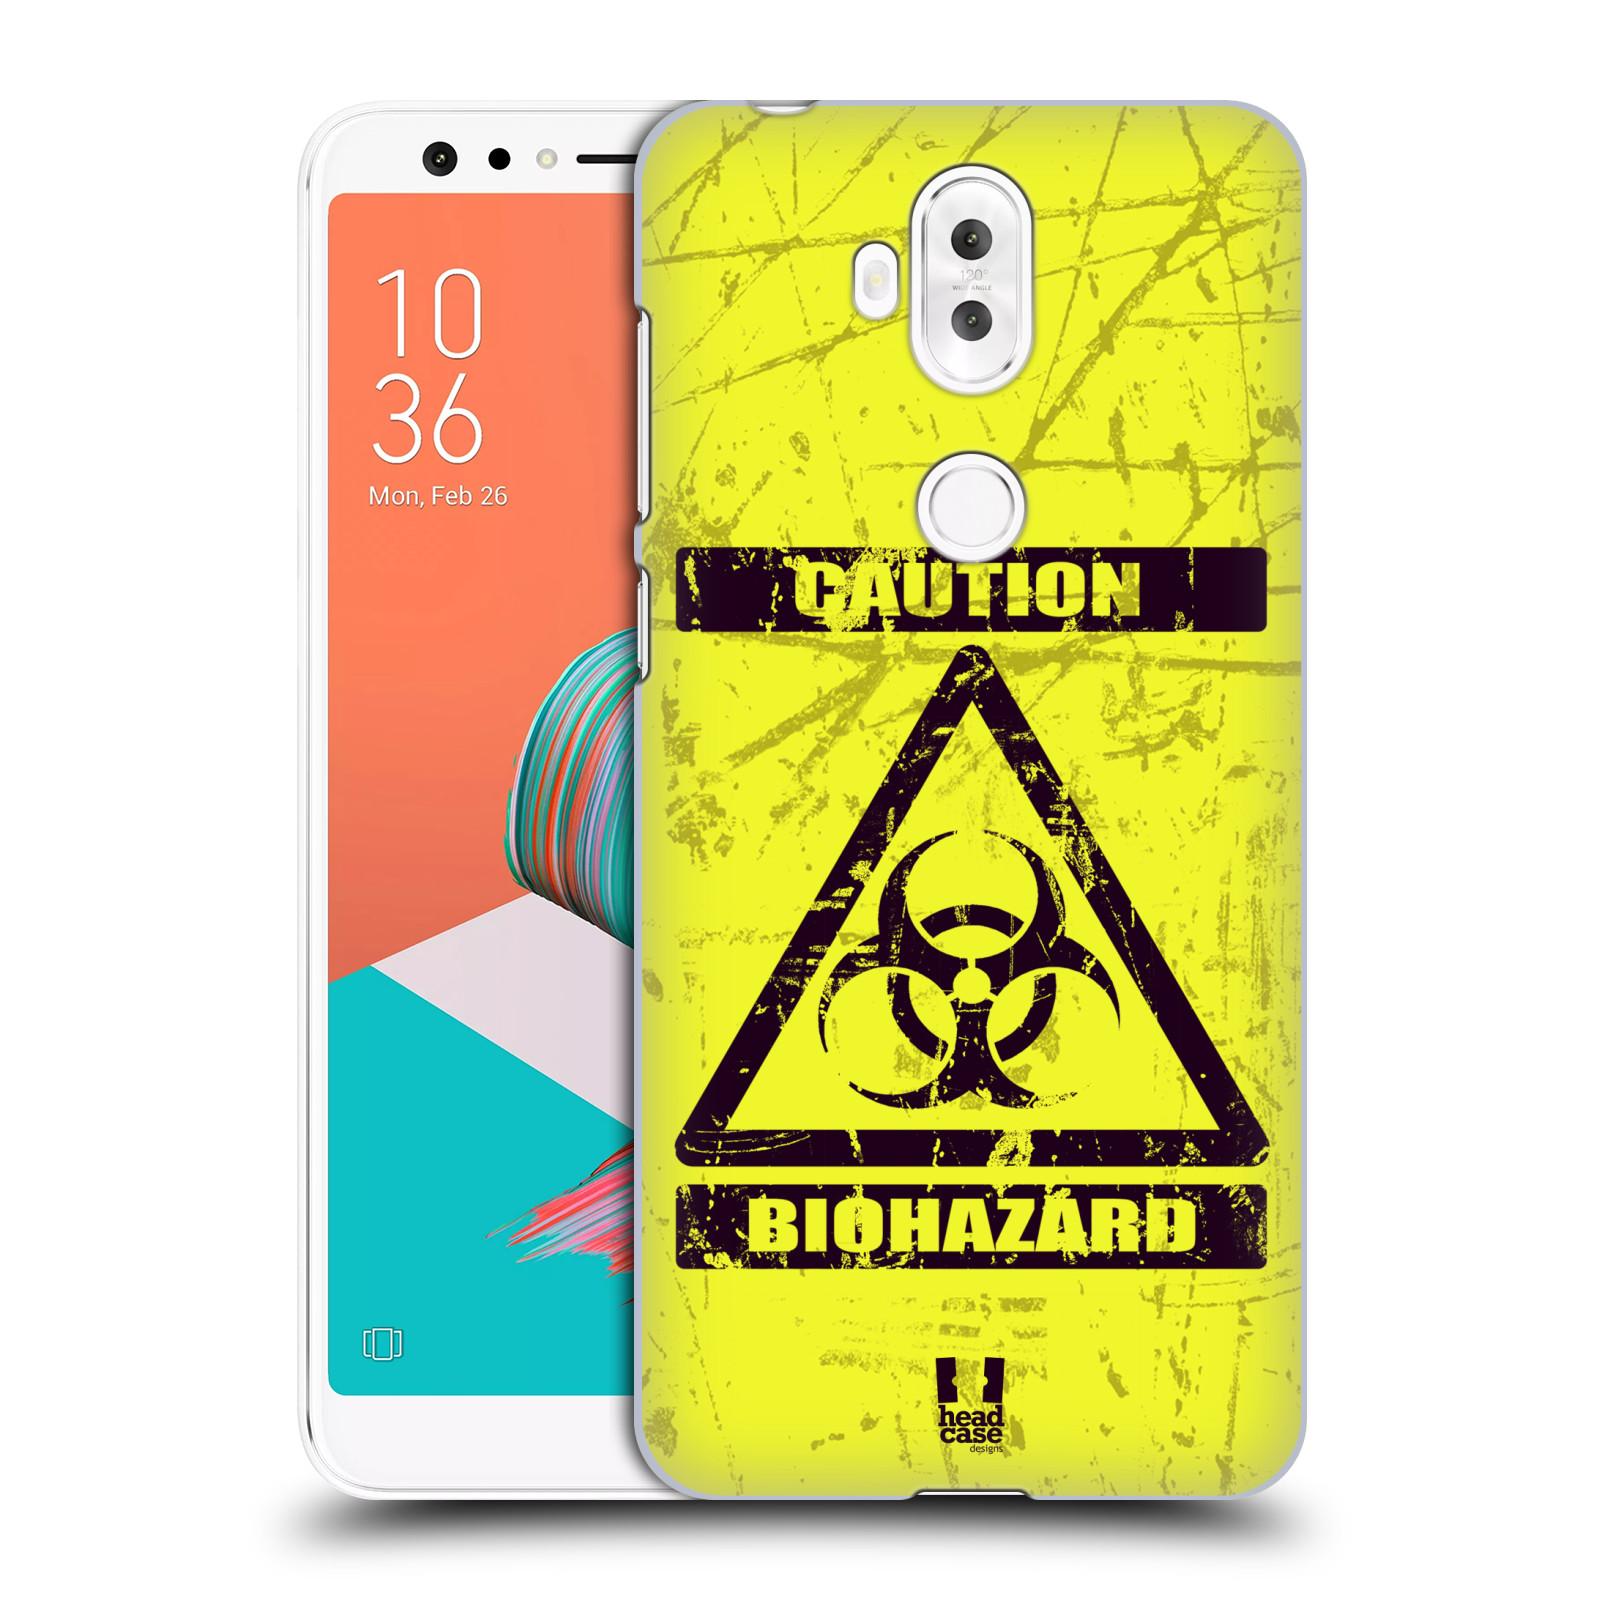 Plastové pouzdro na mobil Asus ZenFone 5 Lite ZC600KL - Head Case - BIOHAZARD (Plastový kryt či obal na mobilní telefon Asus ZenFone 5 Lite (ZC600KL) s motivem BIOHAZARD)